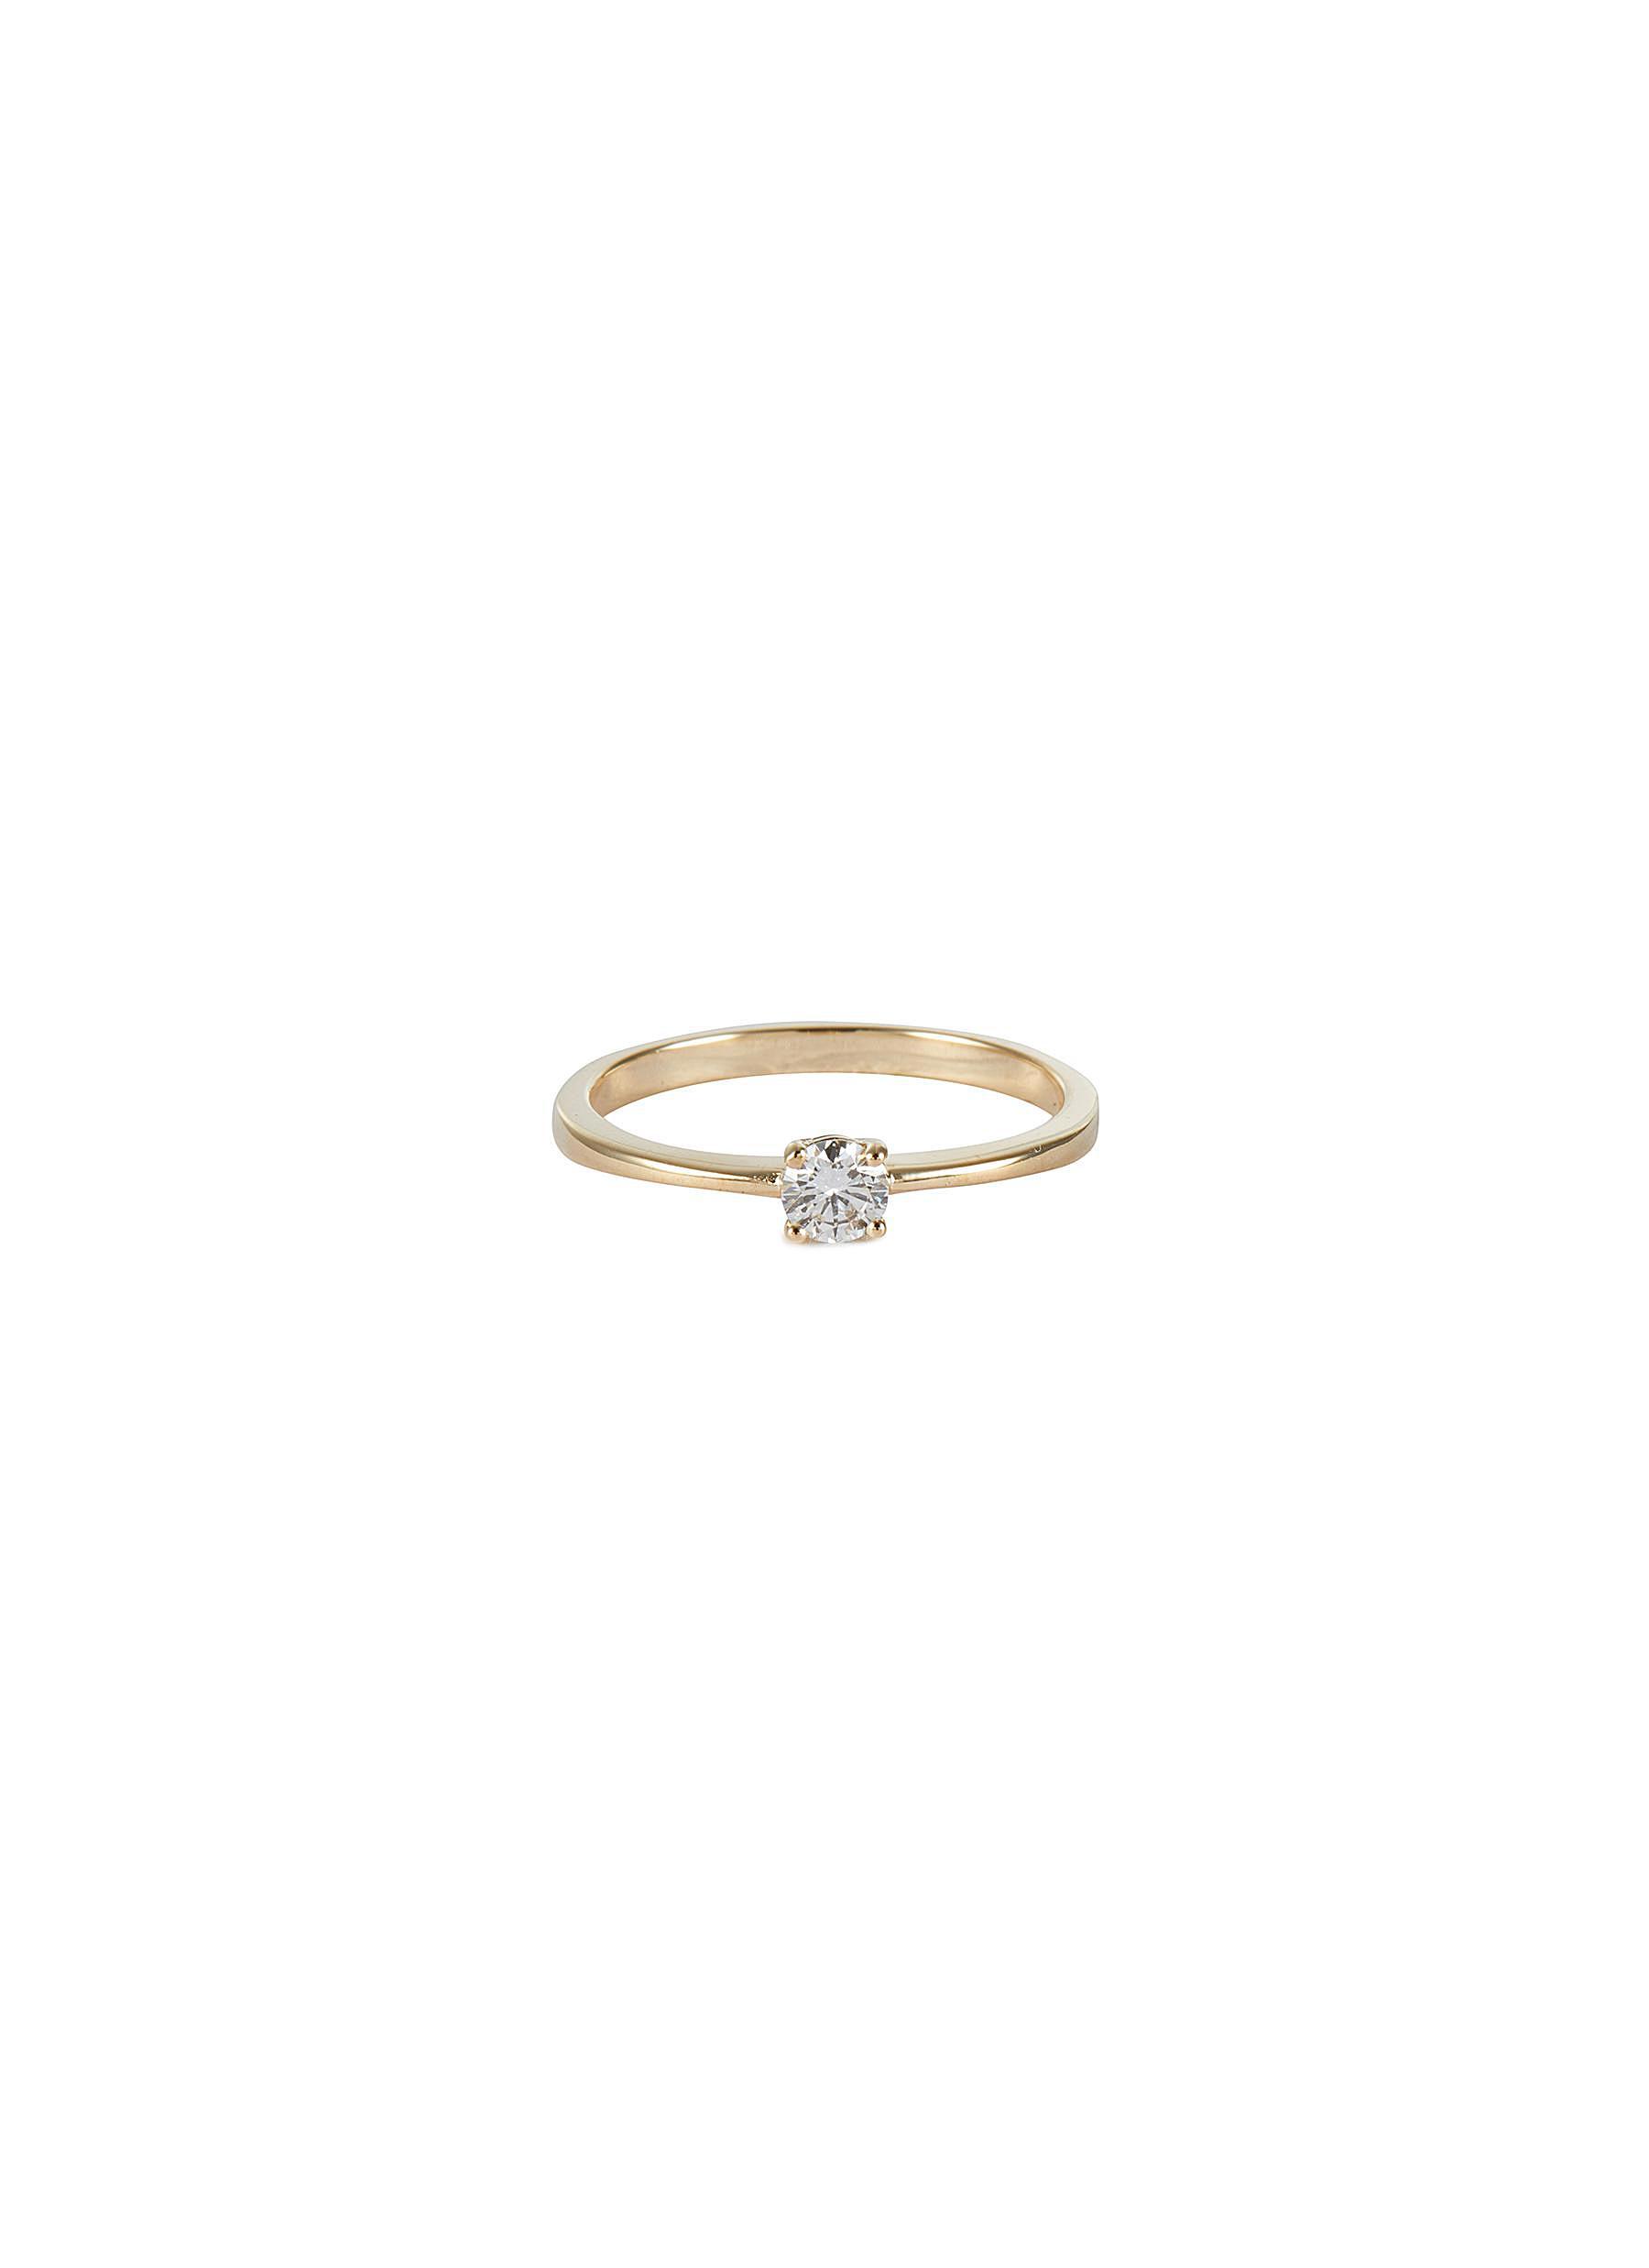 'Alora' lab grown diamond 9k gold ring